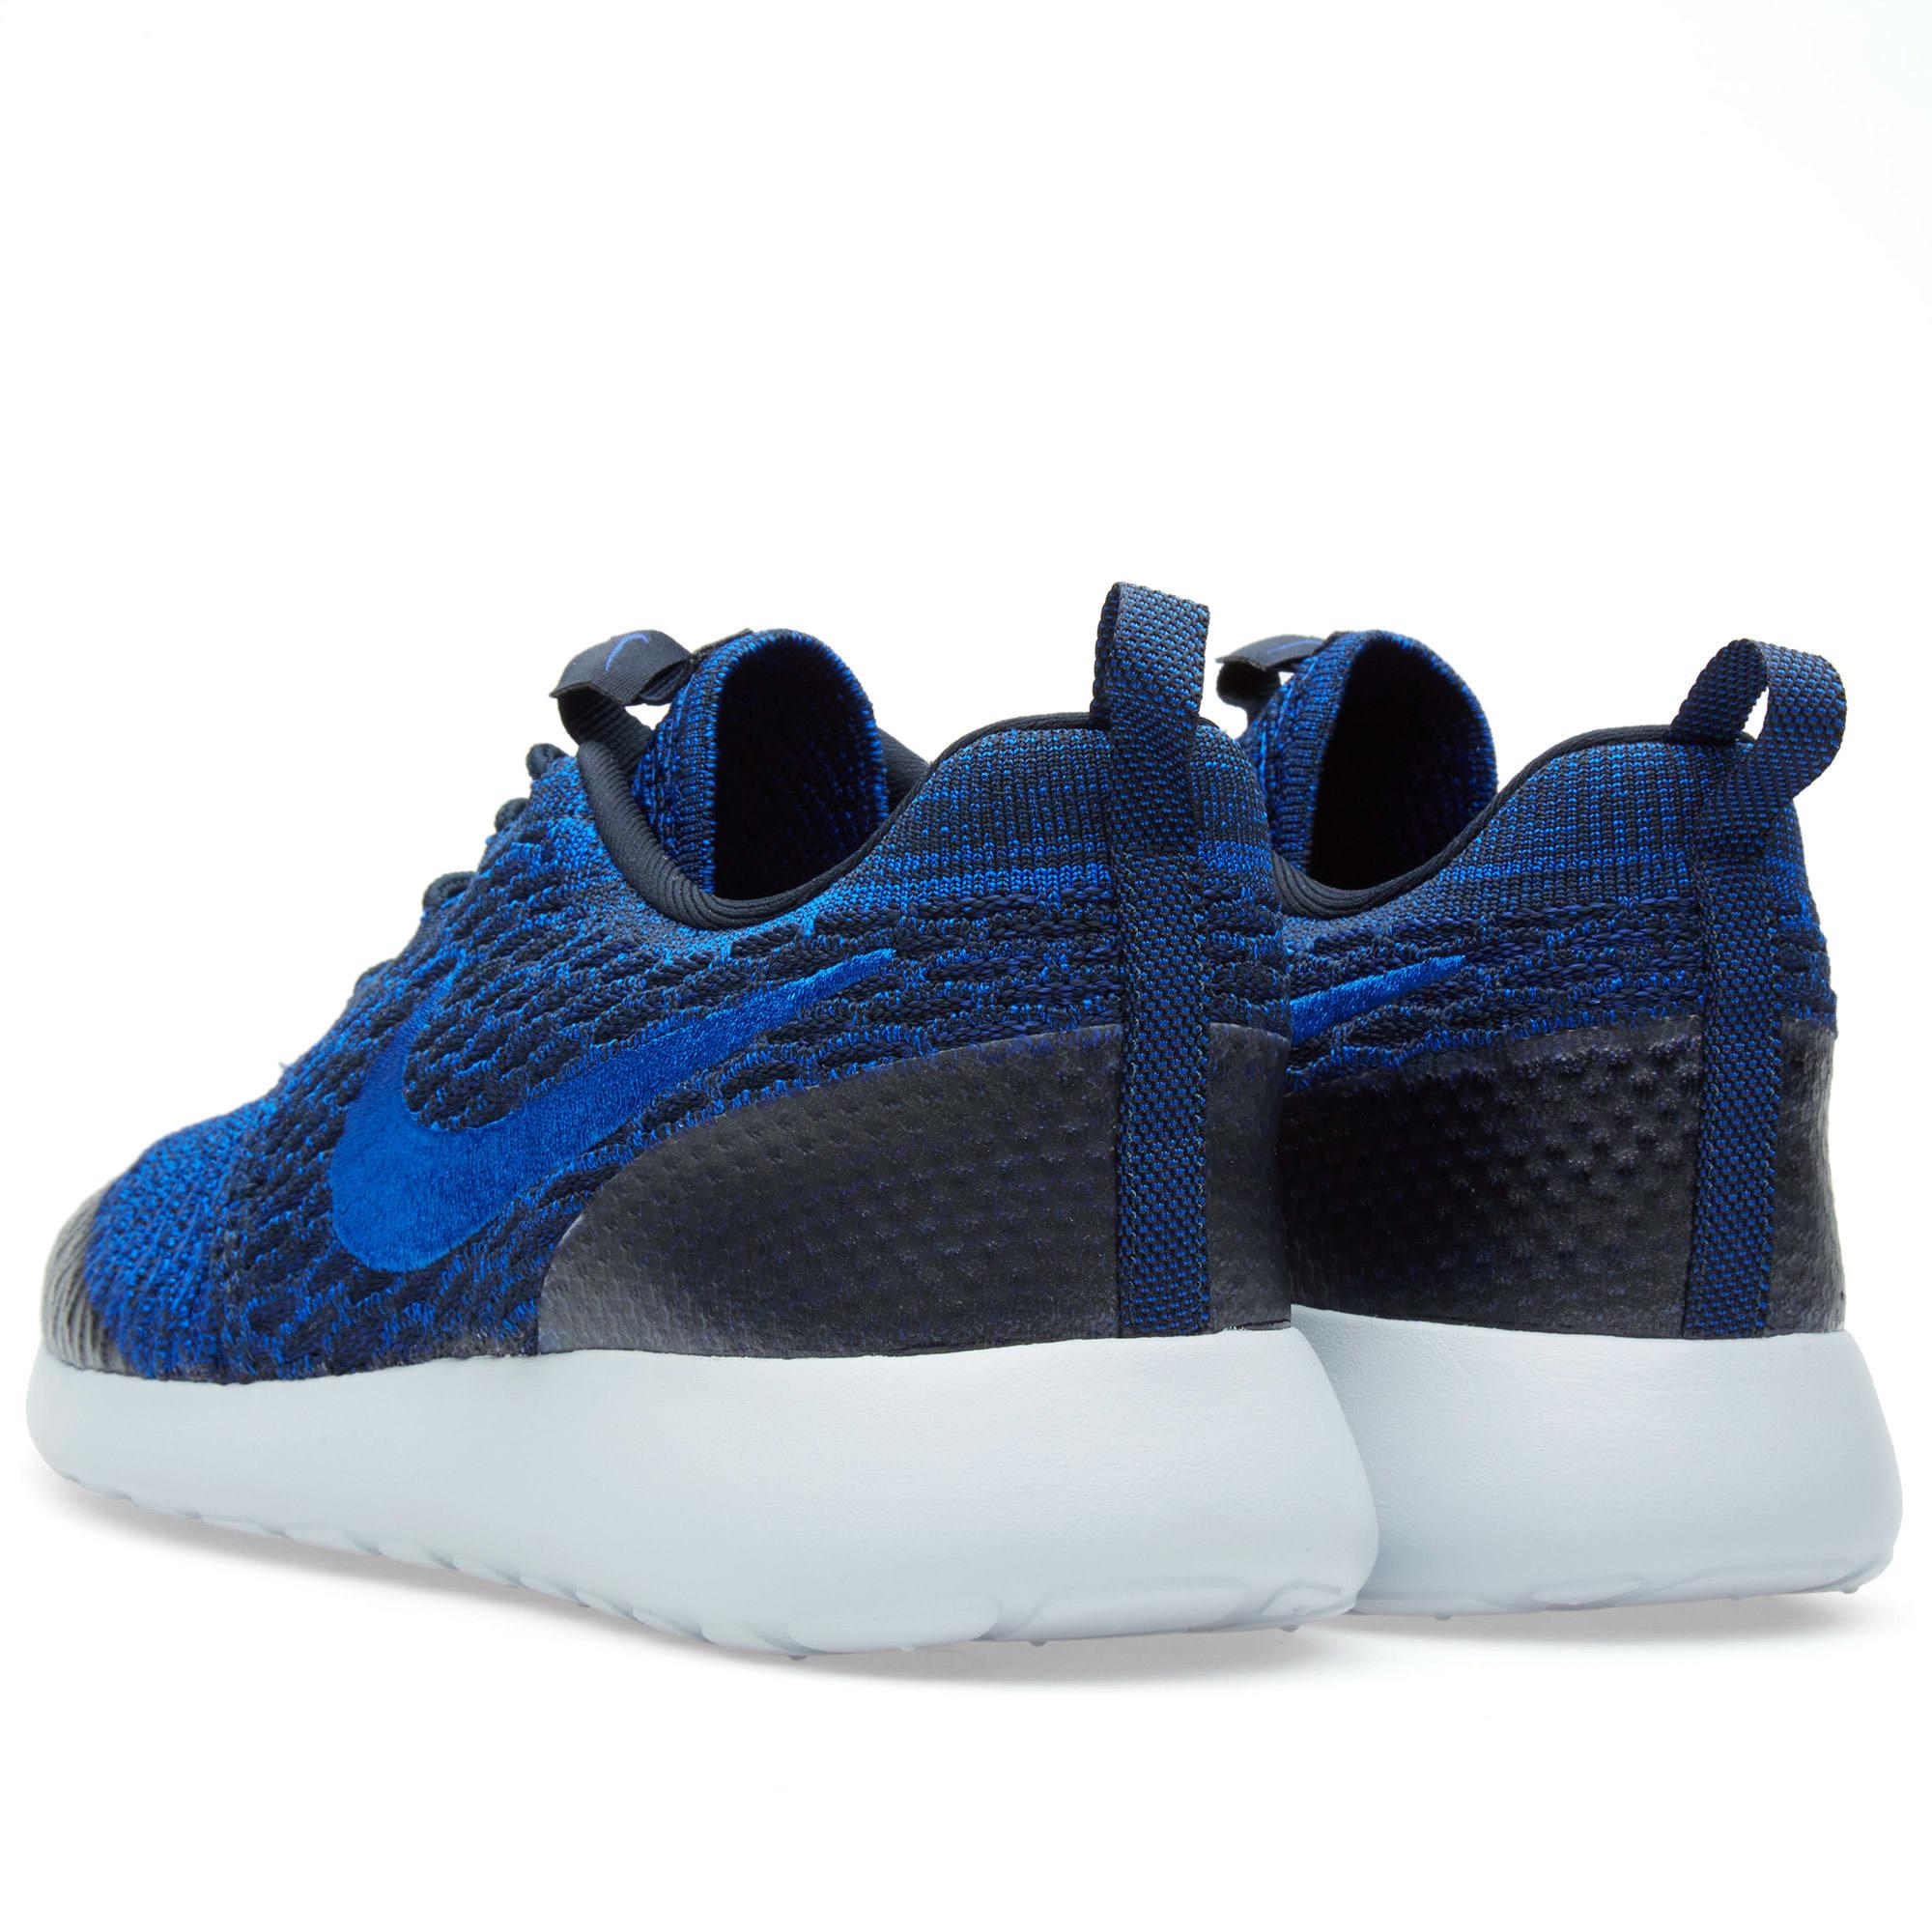 026ae46d01a83 Nike W Roshe One Flyknit Dark Obsidian   Racer Blue